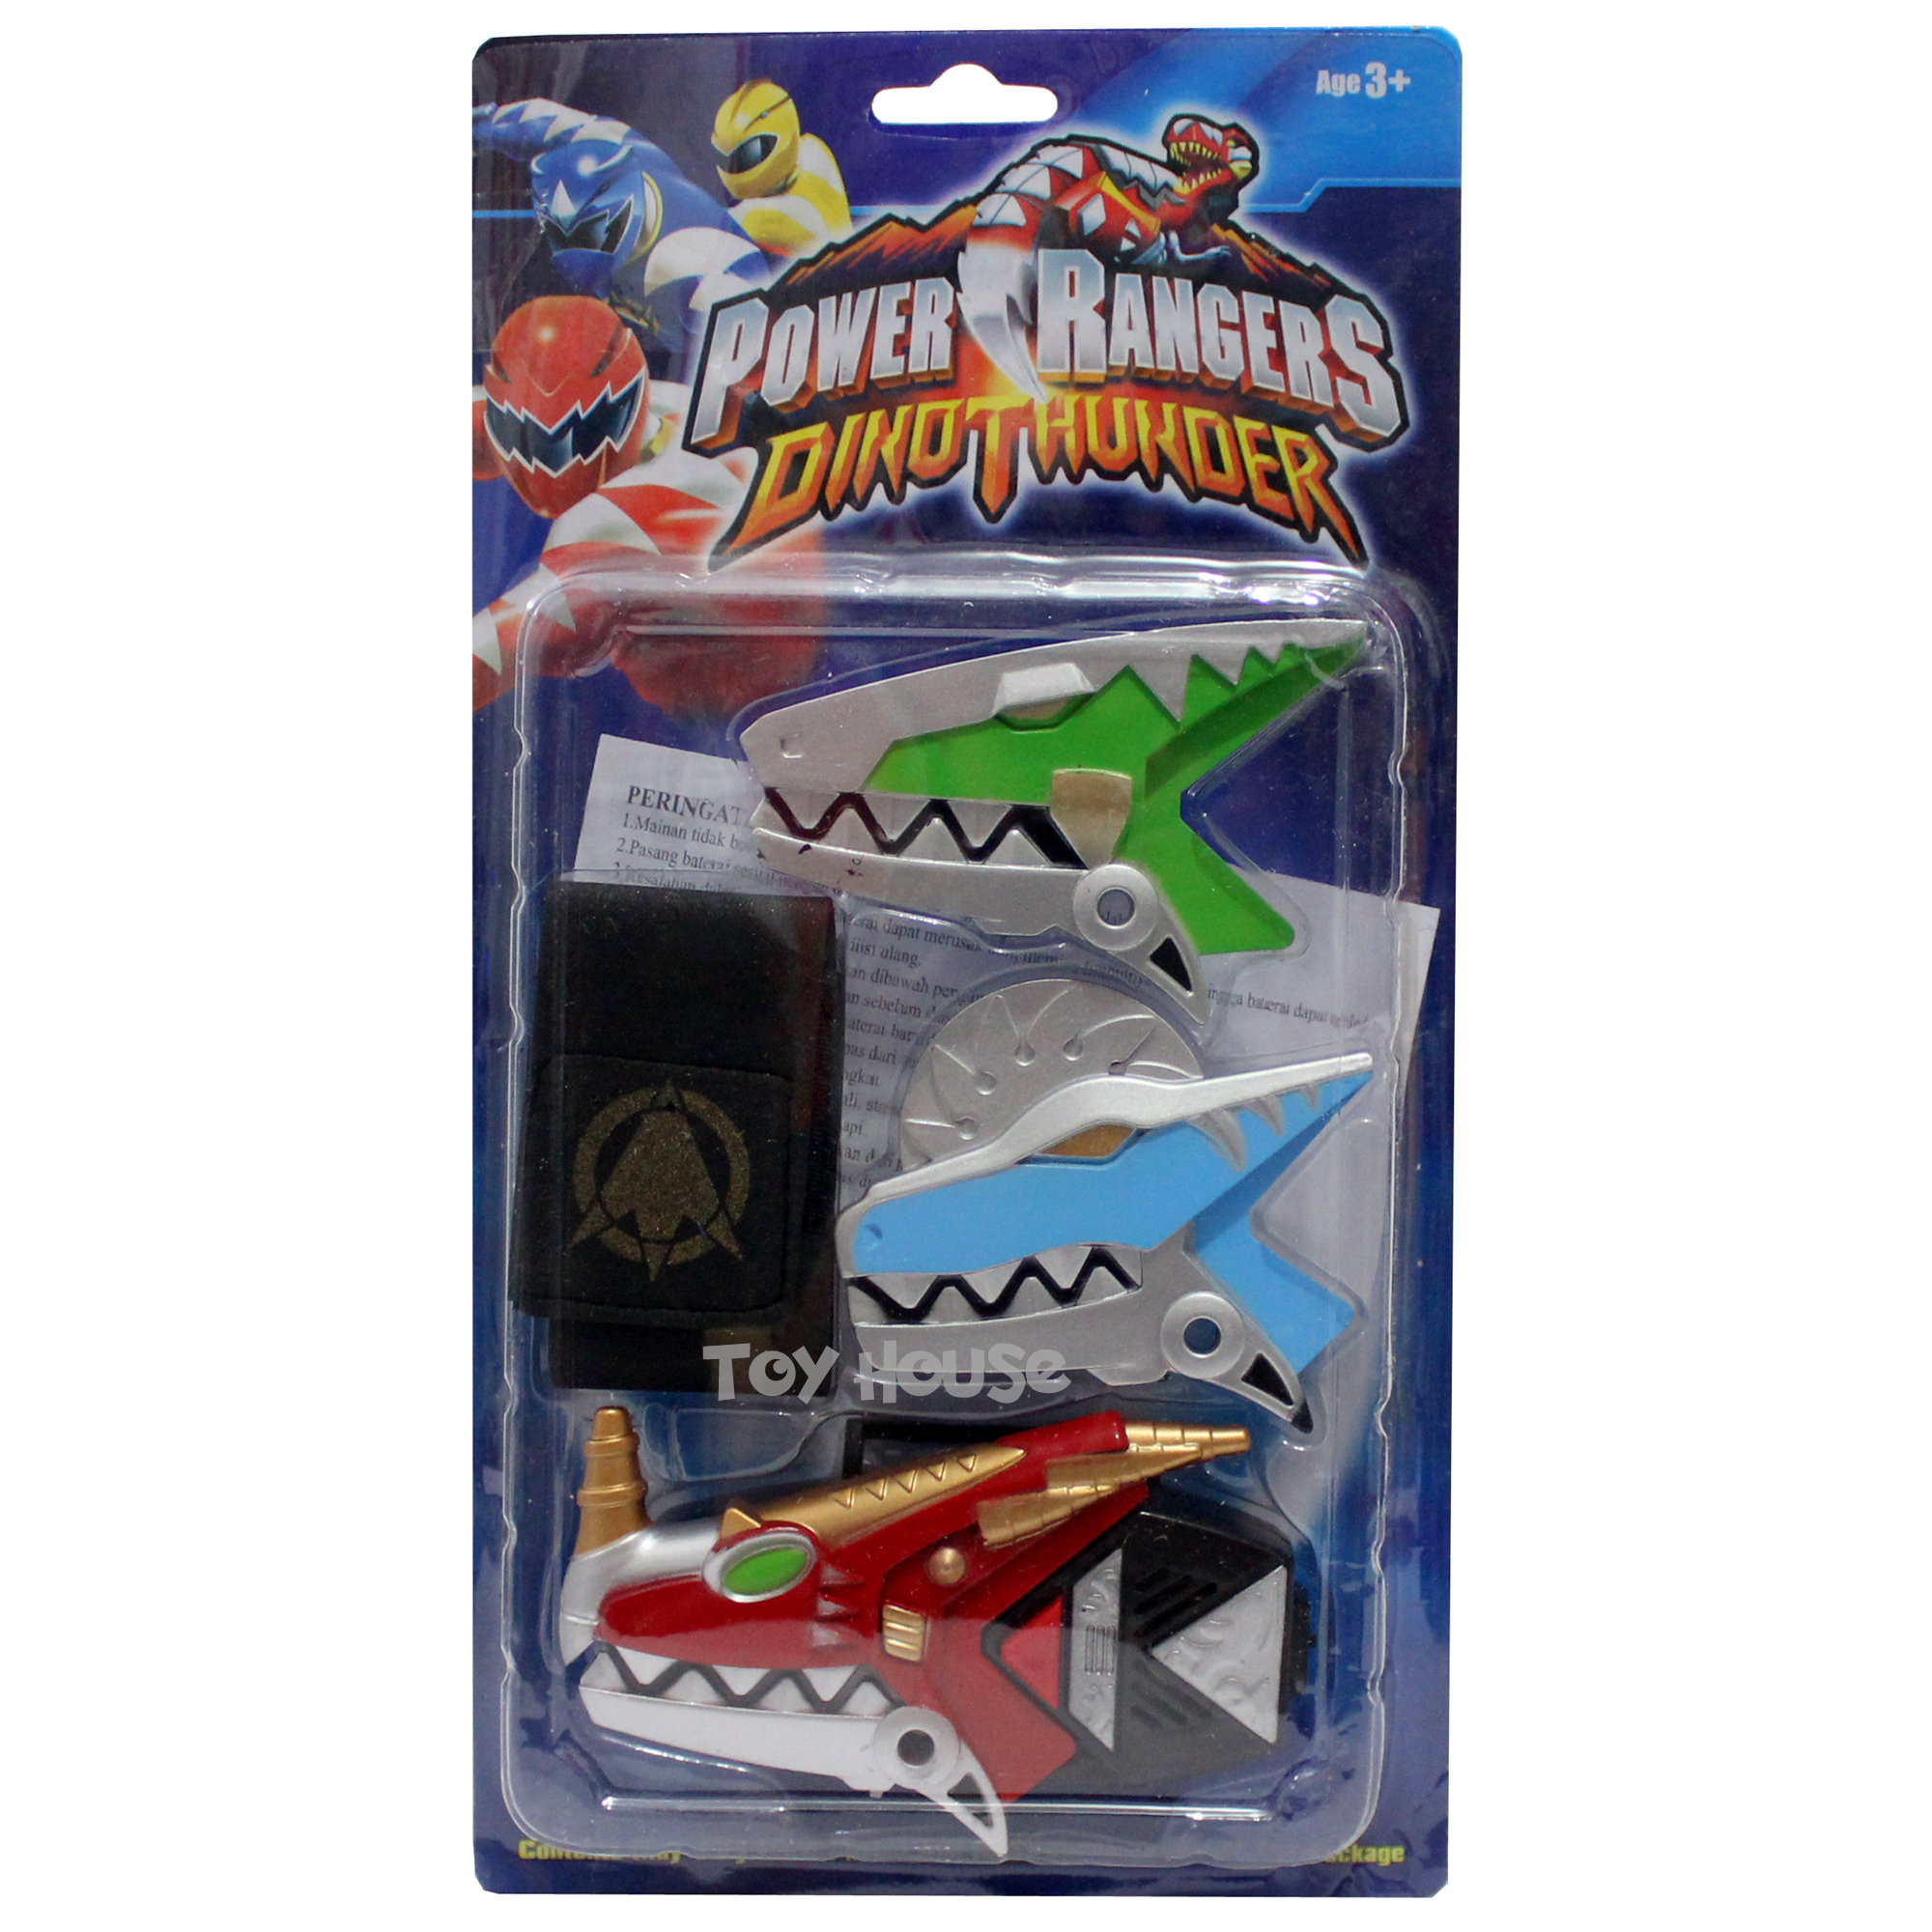 Mainan Gelang Perubahan Power Rangers Dhino Thunder Bayi & Anak Mainan Anak & Bayi di Carousell